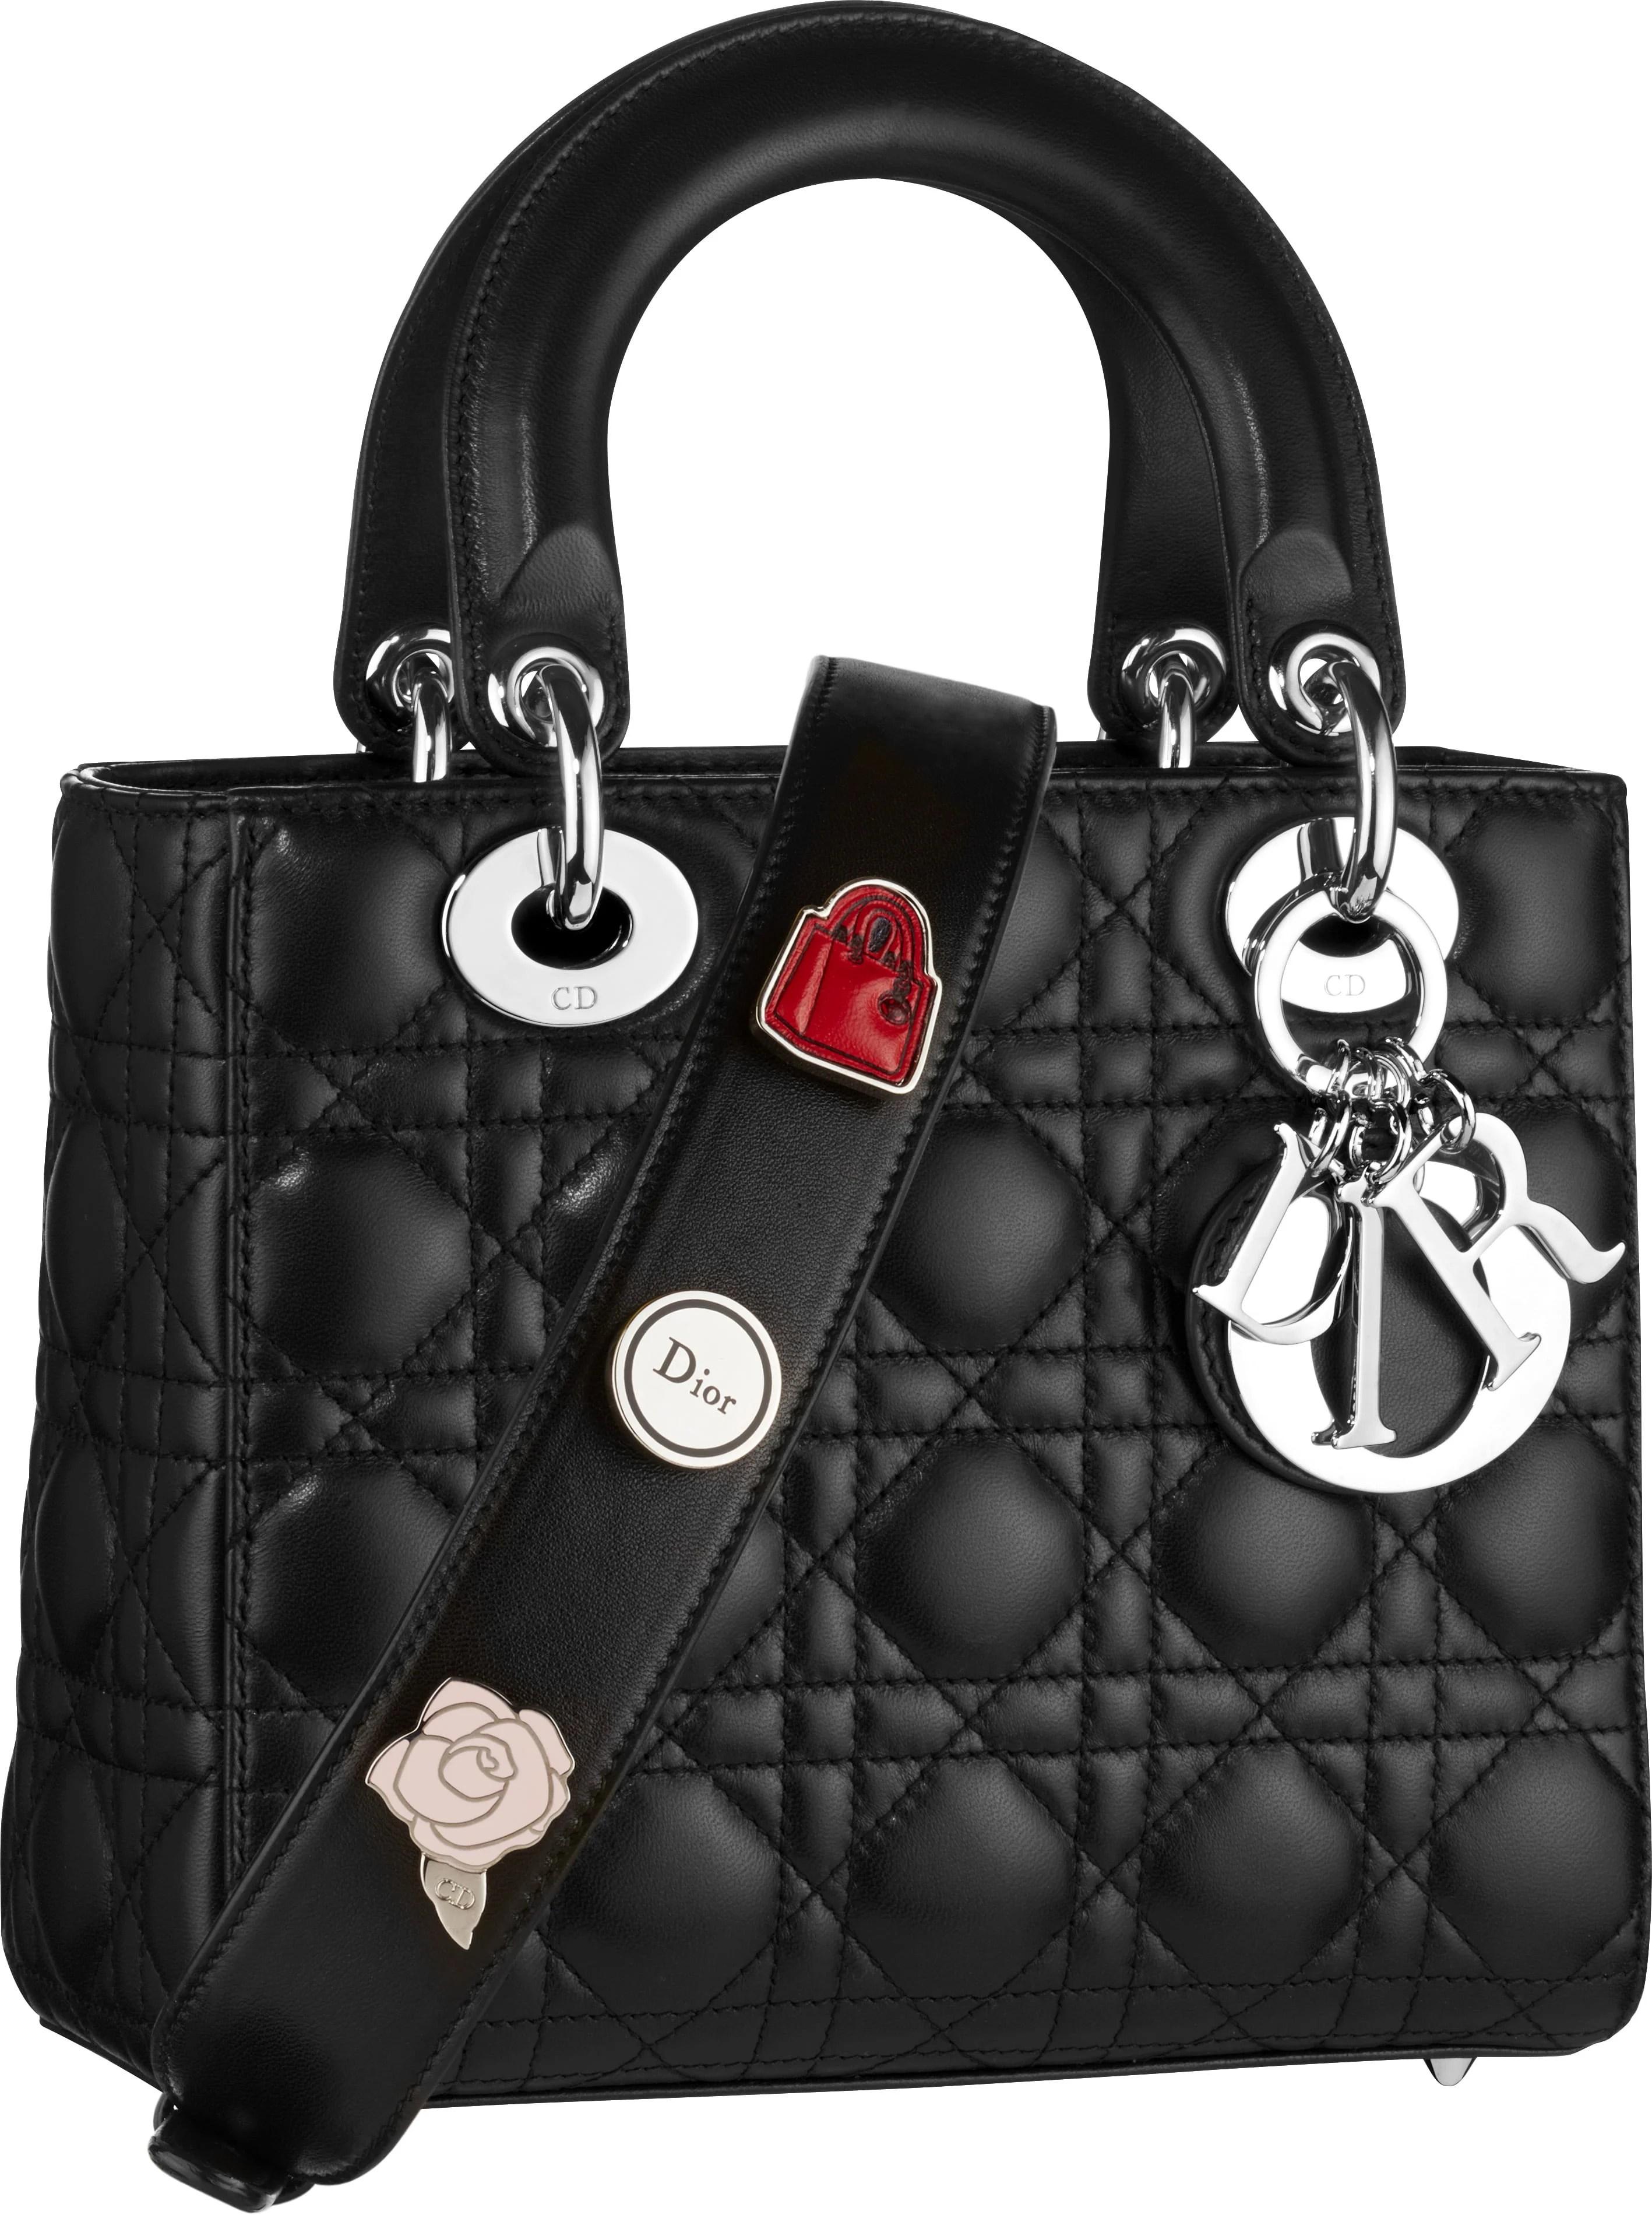 Lady Dior Small Pins - Black